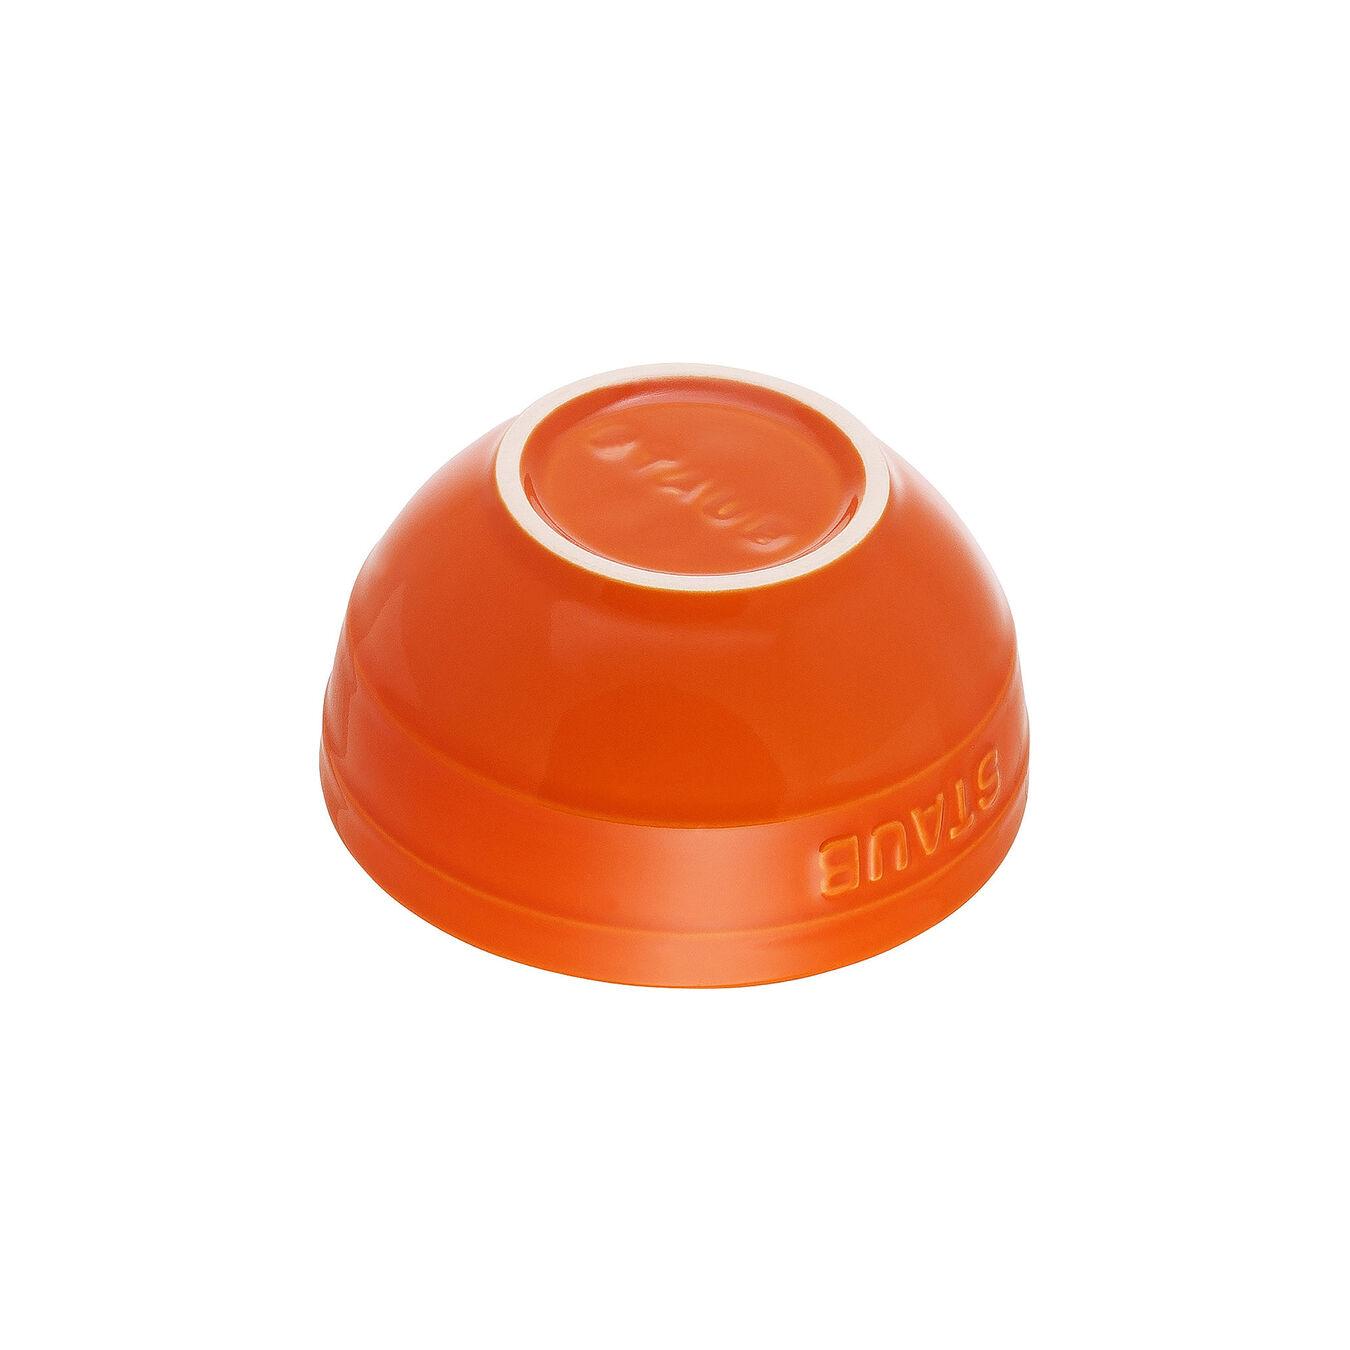 Schüssel 12 cm, Keramik, Orange,,large 2